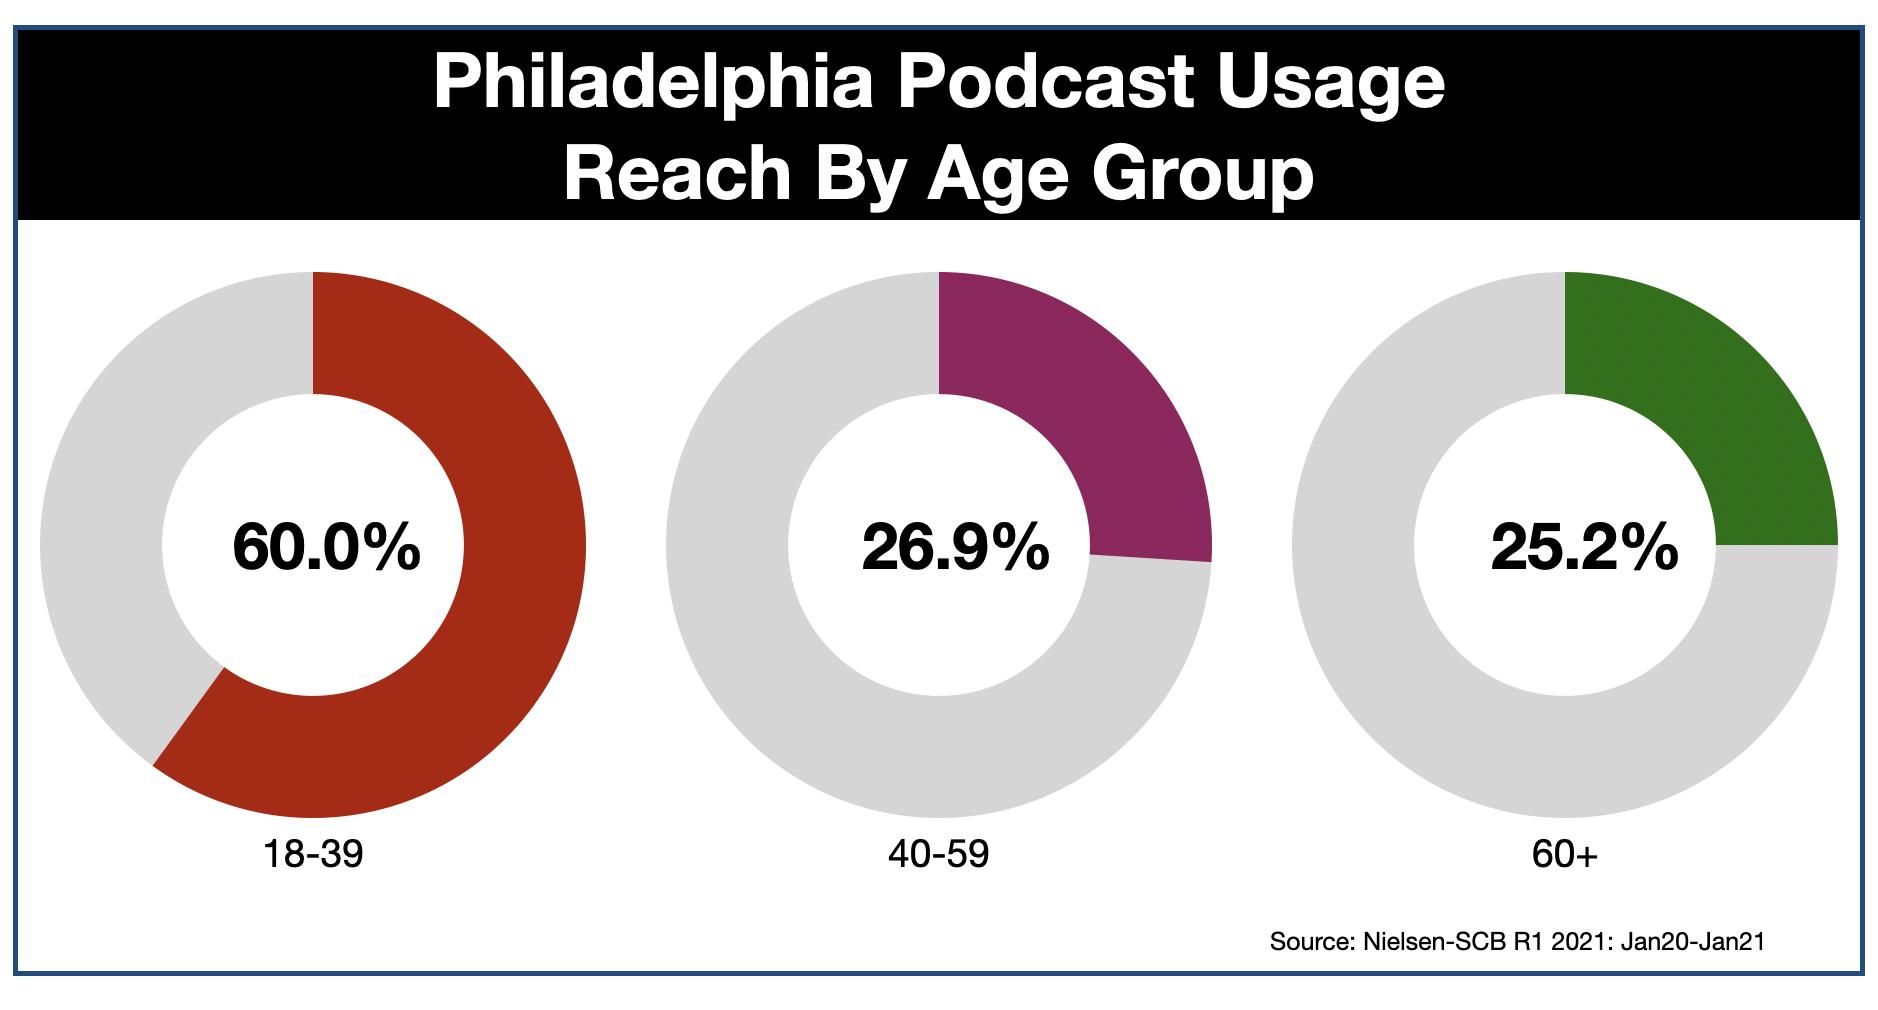 Podcast Advertising In Philadelphia AGE